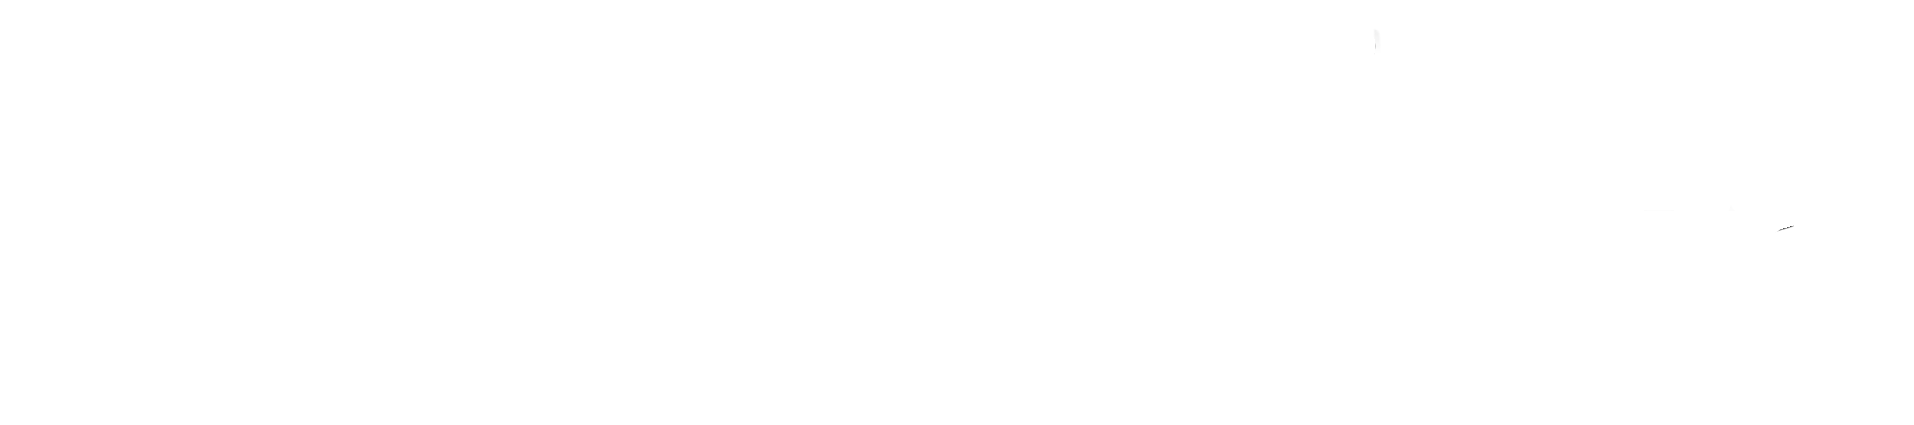 Almargem - Via Algarviana